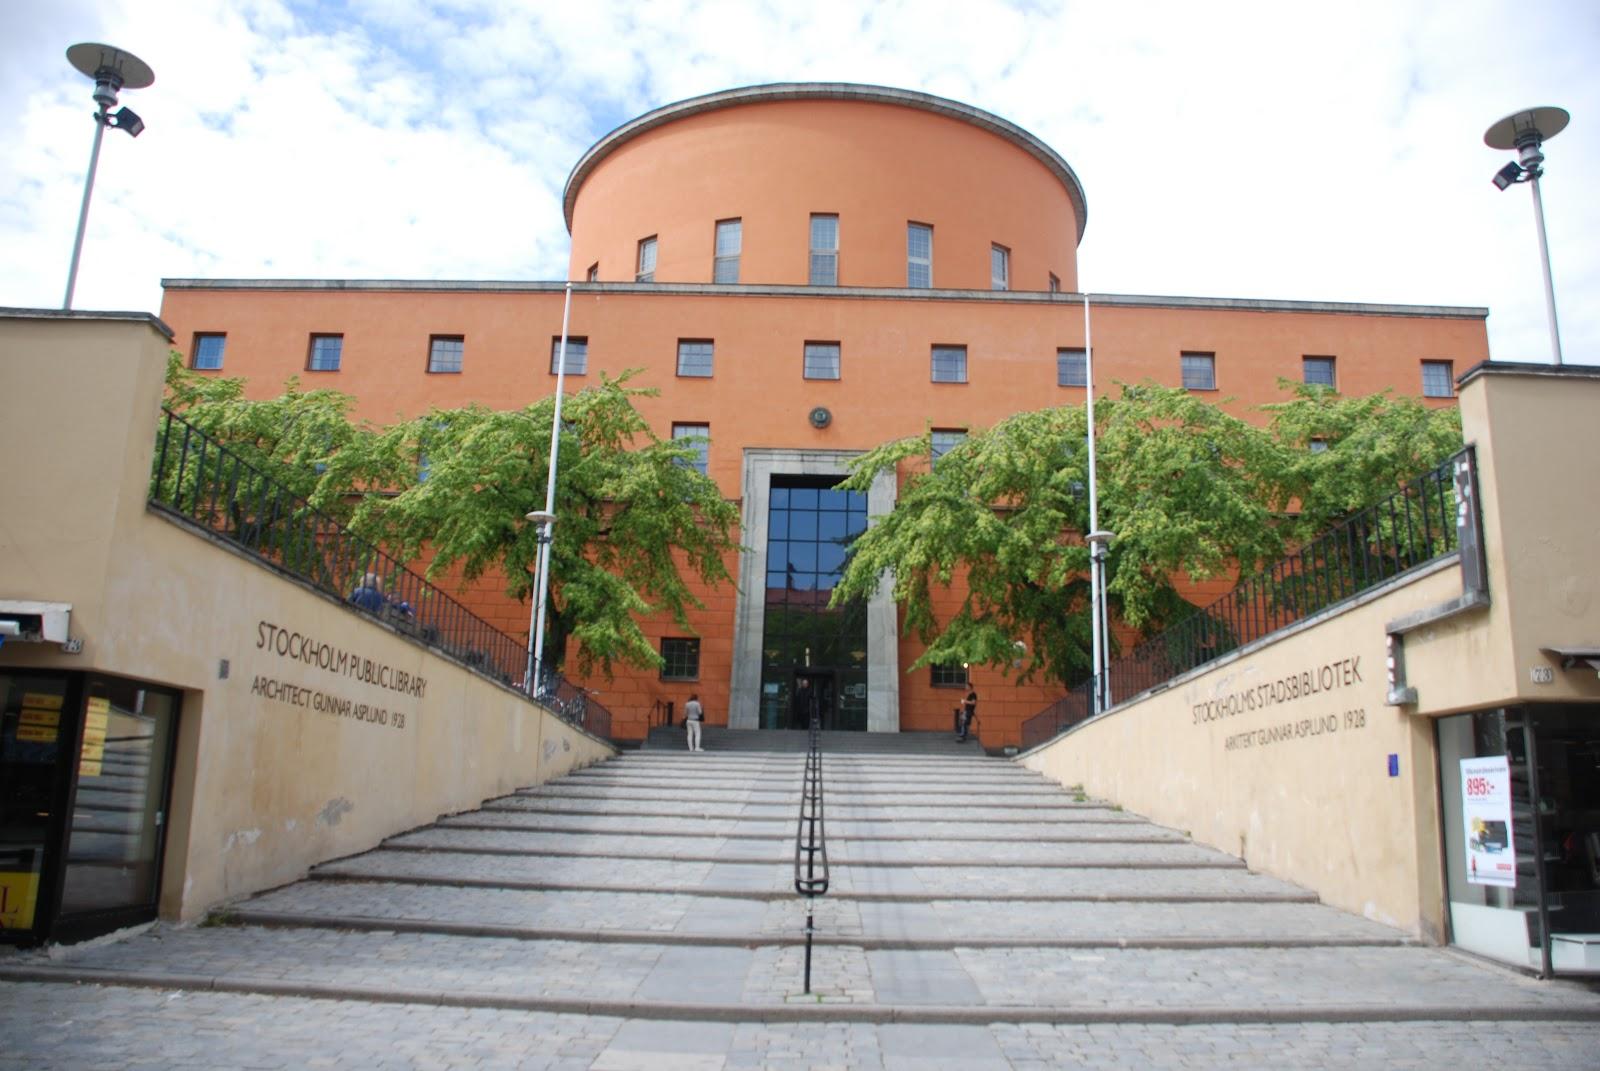 podium stair, Stockholm Public Library - Gunnar Asplund